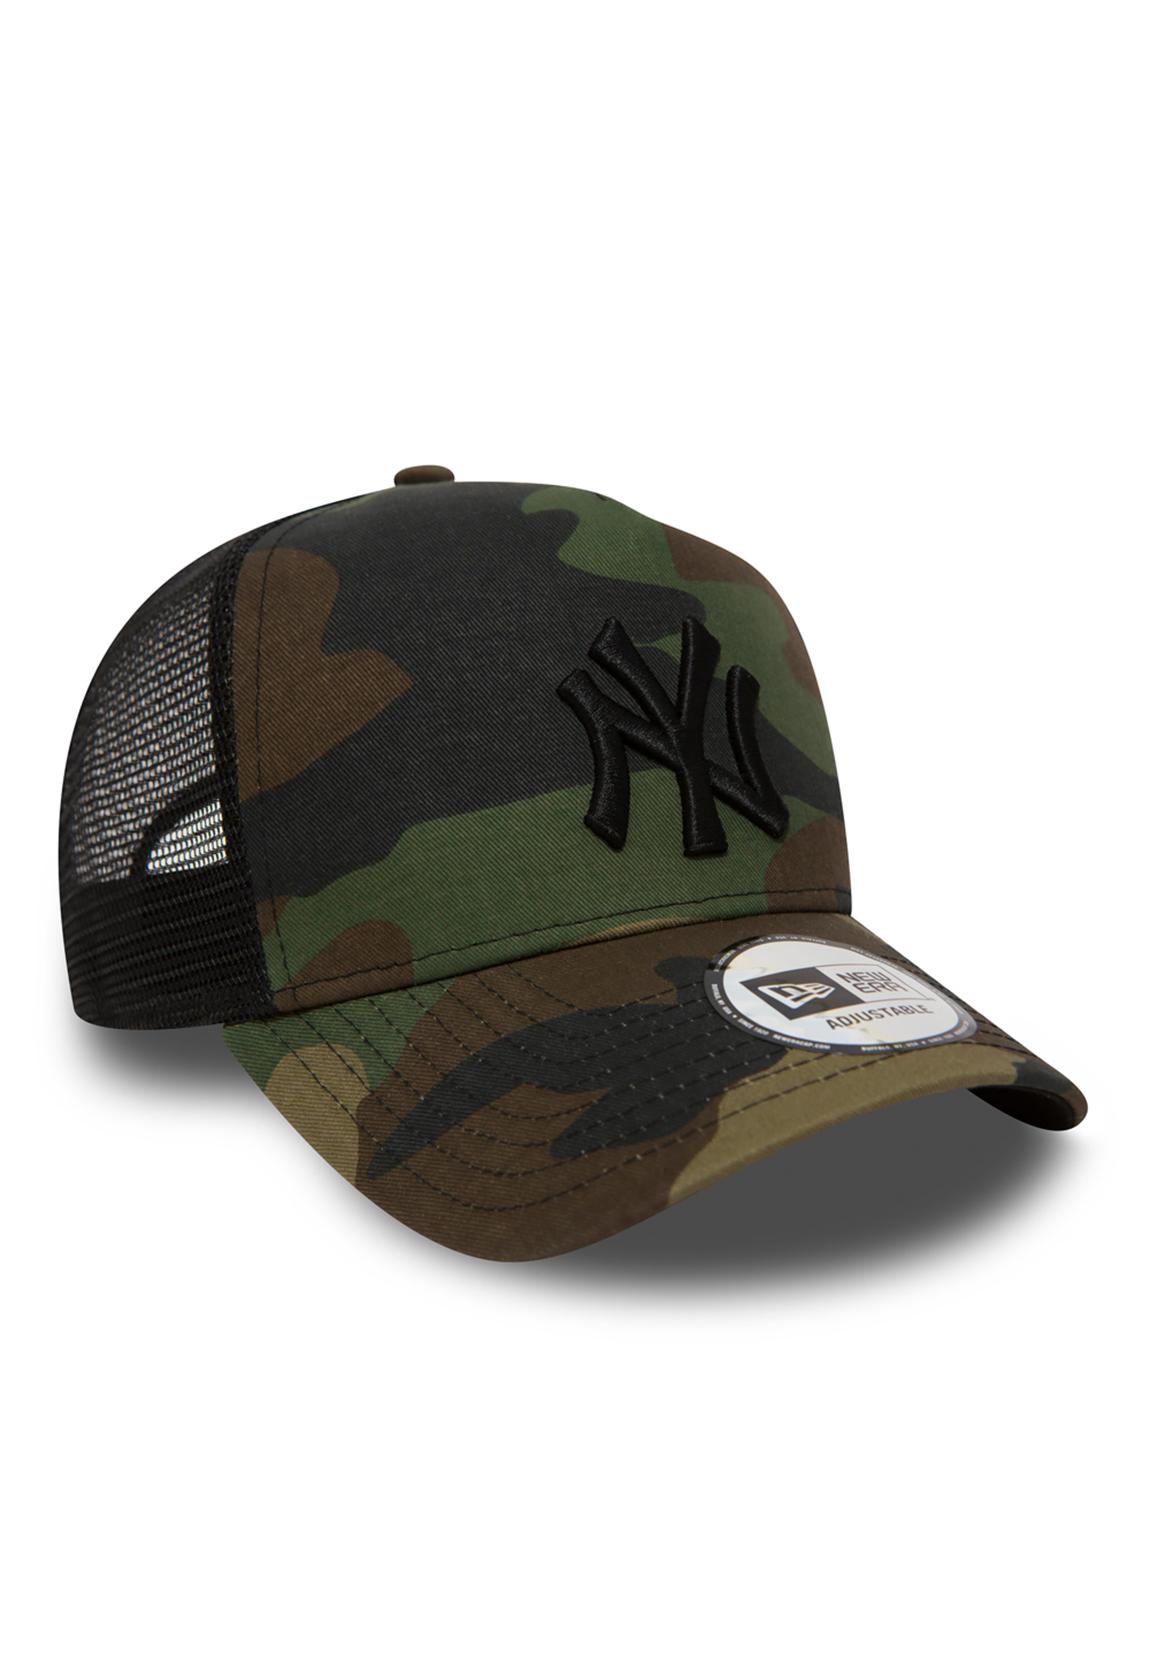 19ba228cea9 New Era Clean Trucker Adjustable Cap Ny Yankees Camouflage